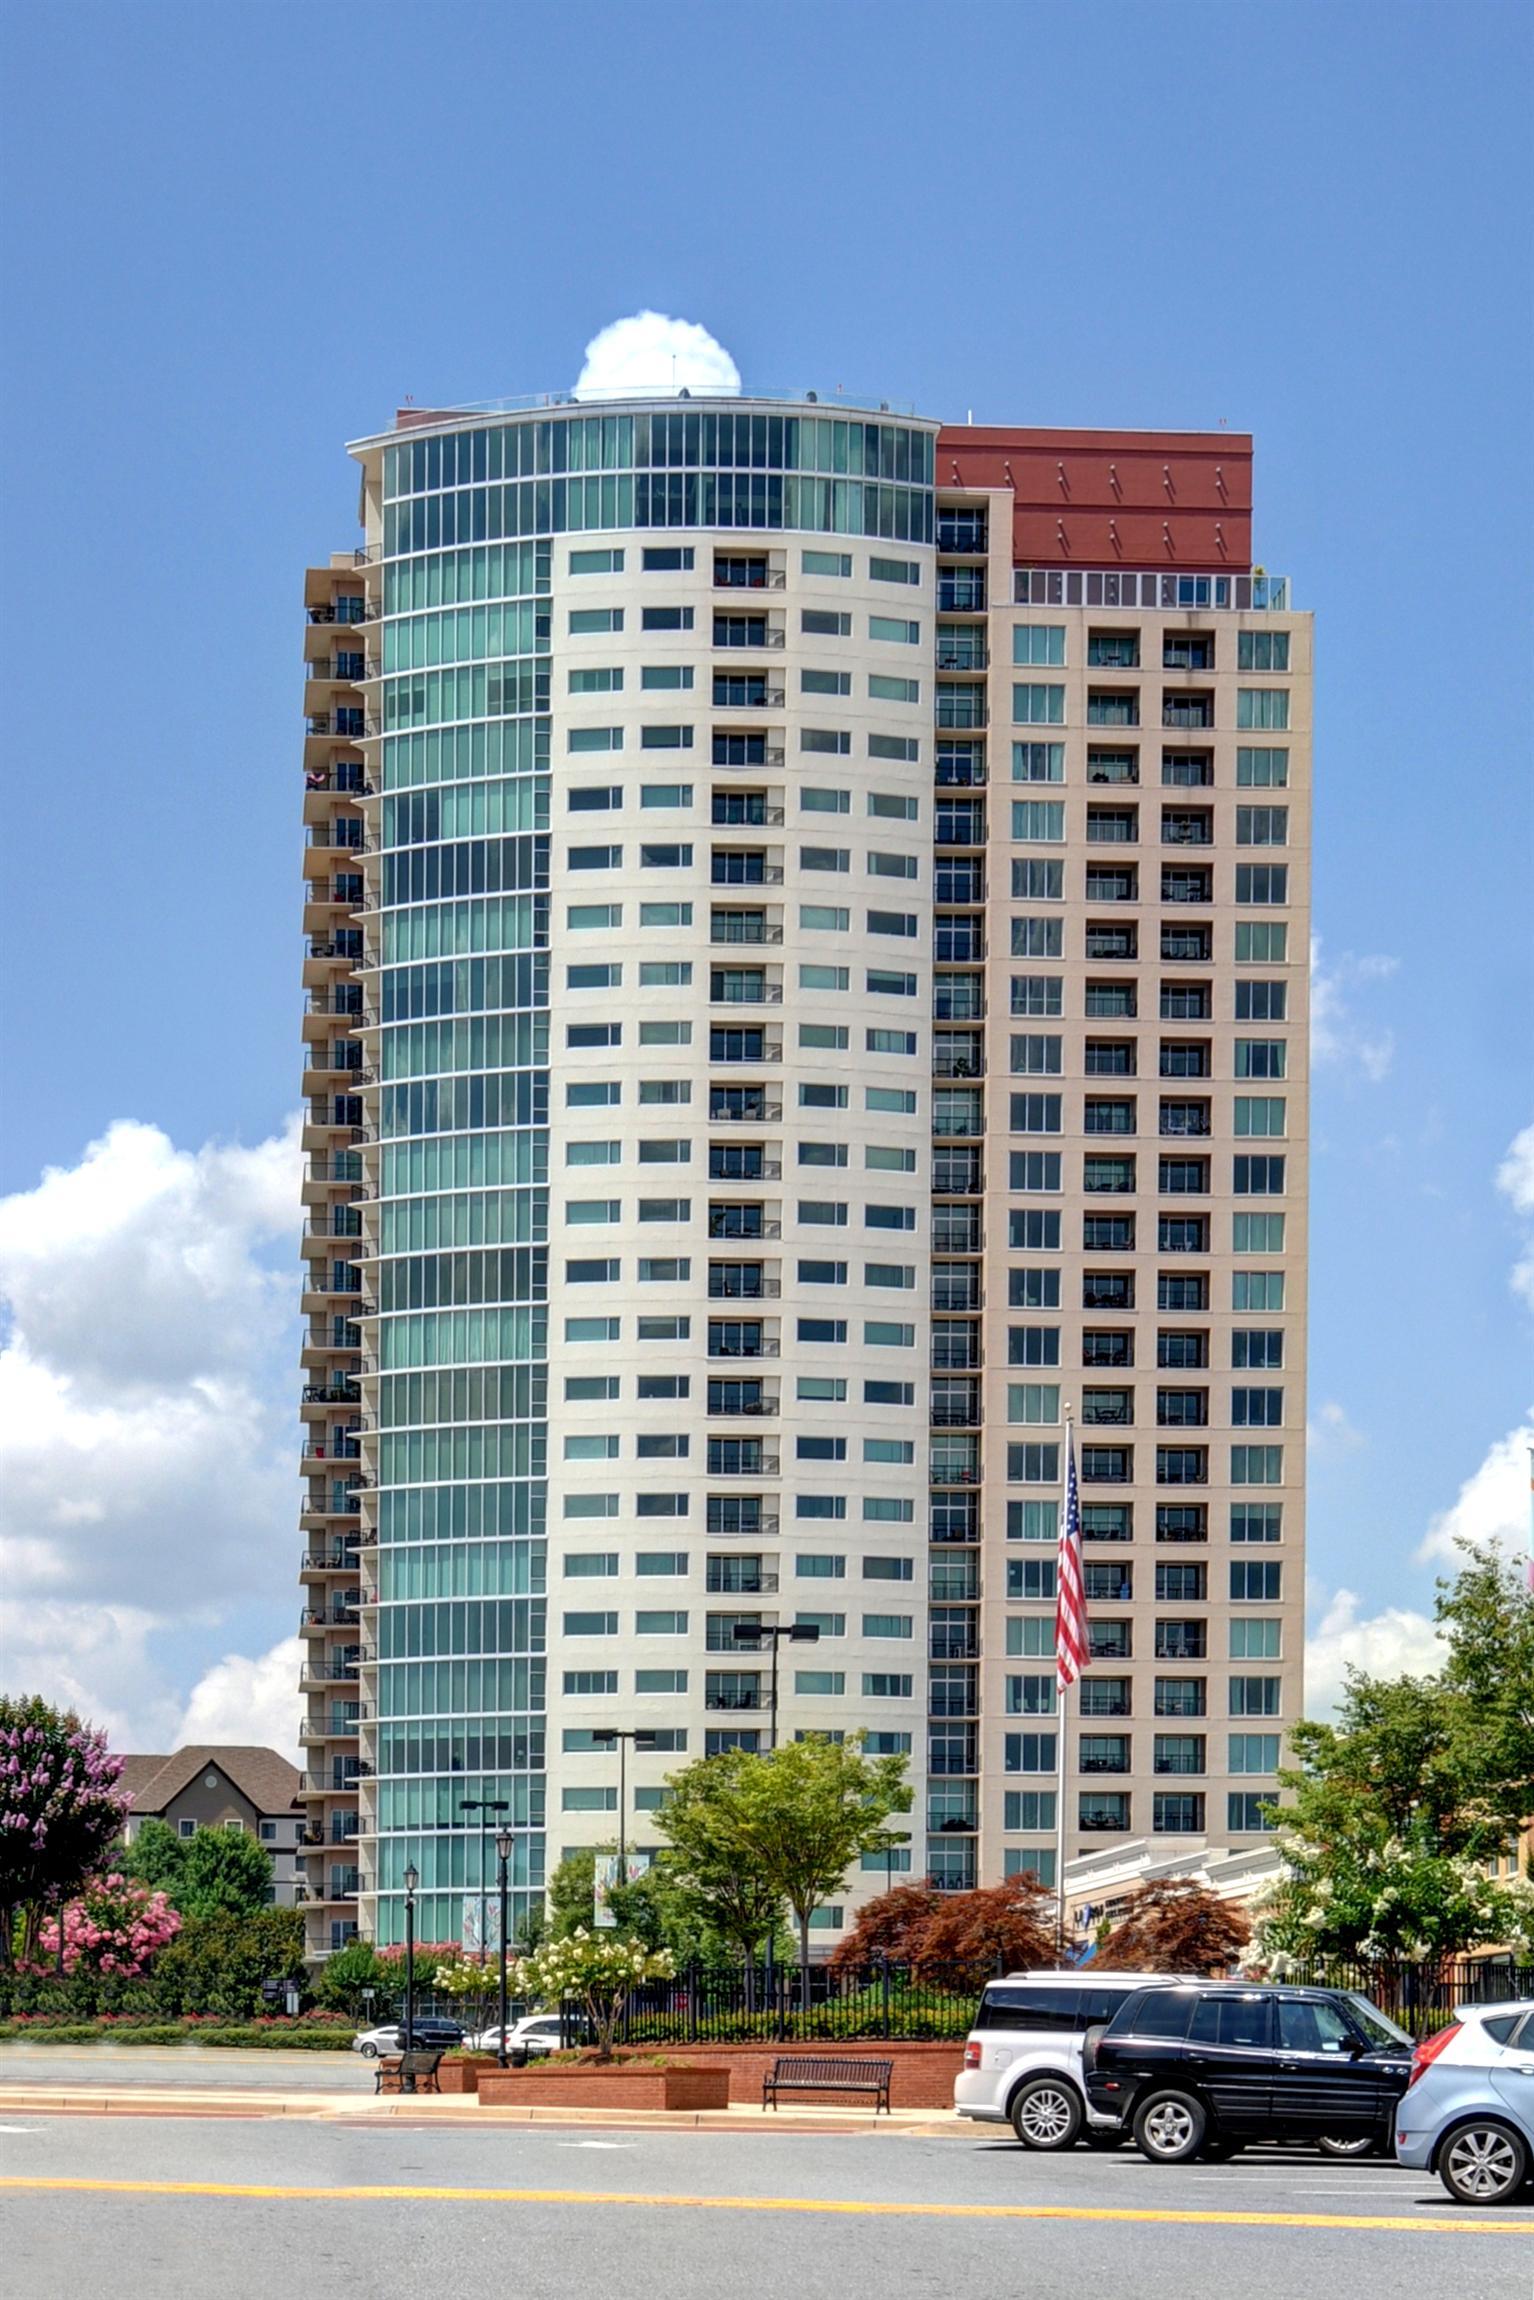 Moradia para Venda às Skyline Views in the heart of the Perimeter 4561 Olde Perimeter Way Atlanta, Geórgia 30346 Estados Unidos